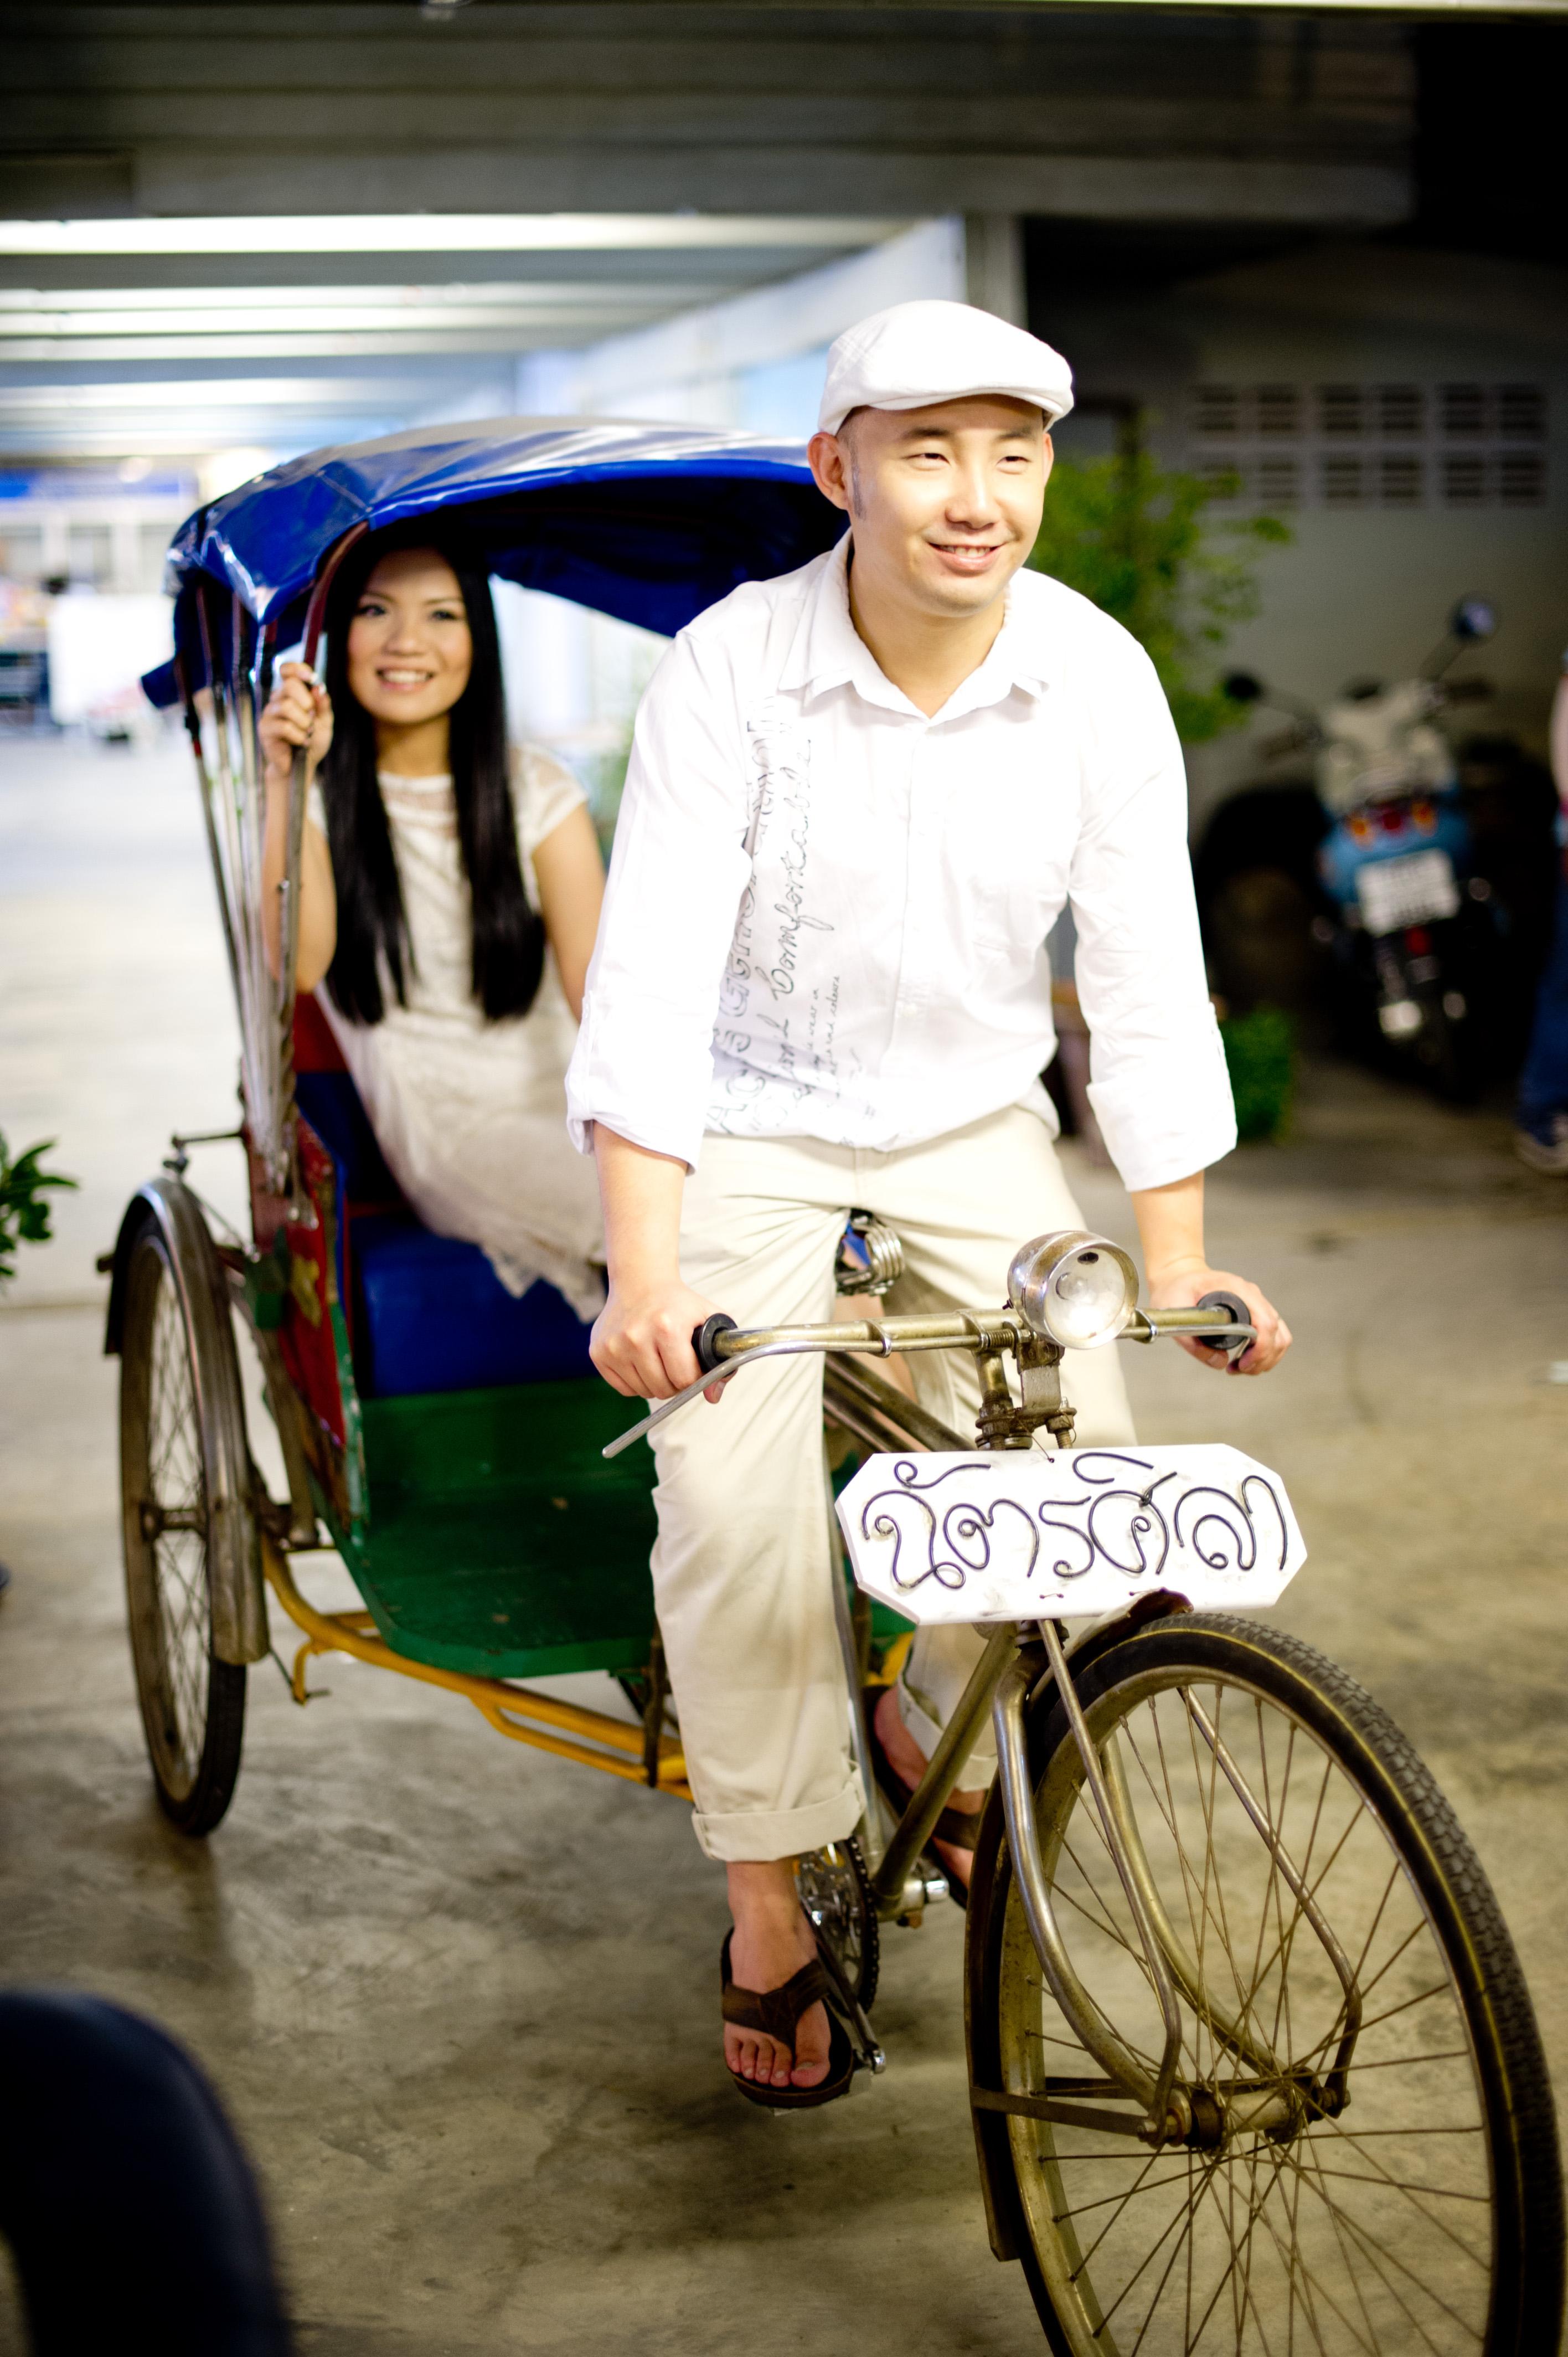 Pre-Wedding at Hua Hin Night Market, Thailand.